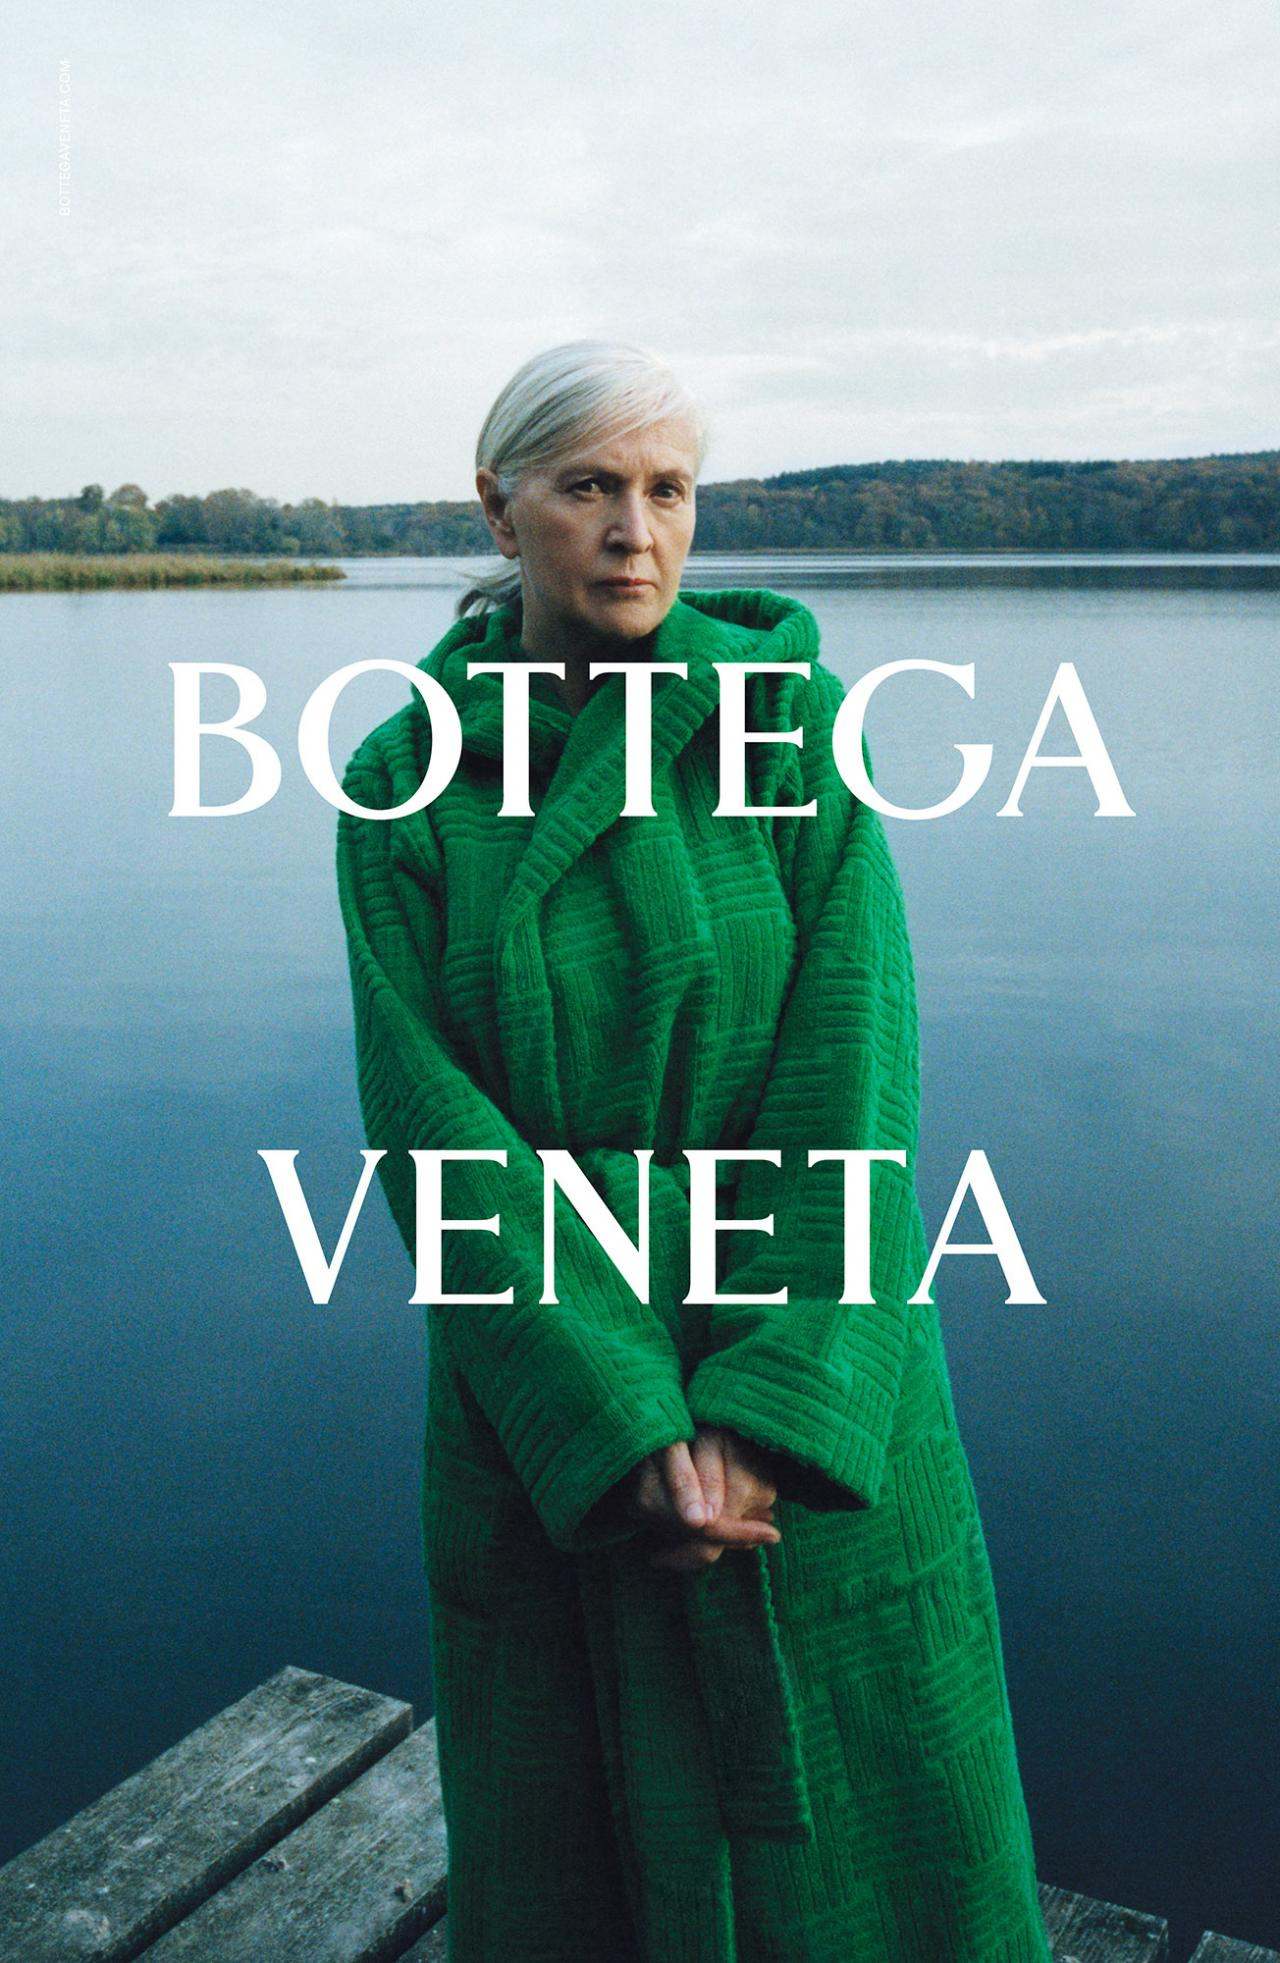 BOTTEGA VENETASalon 01 Campaign Artist Rosemarie Trockel, photographed by Tyrone Lebon